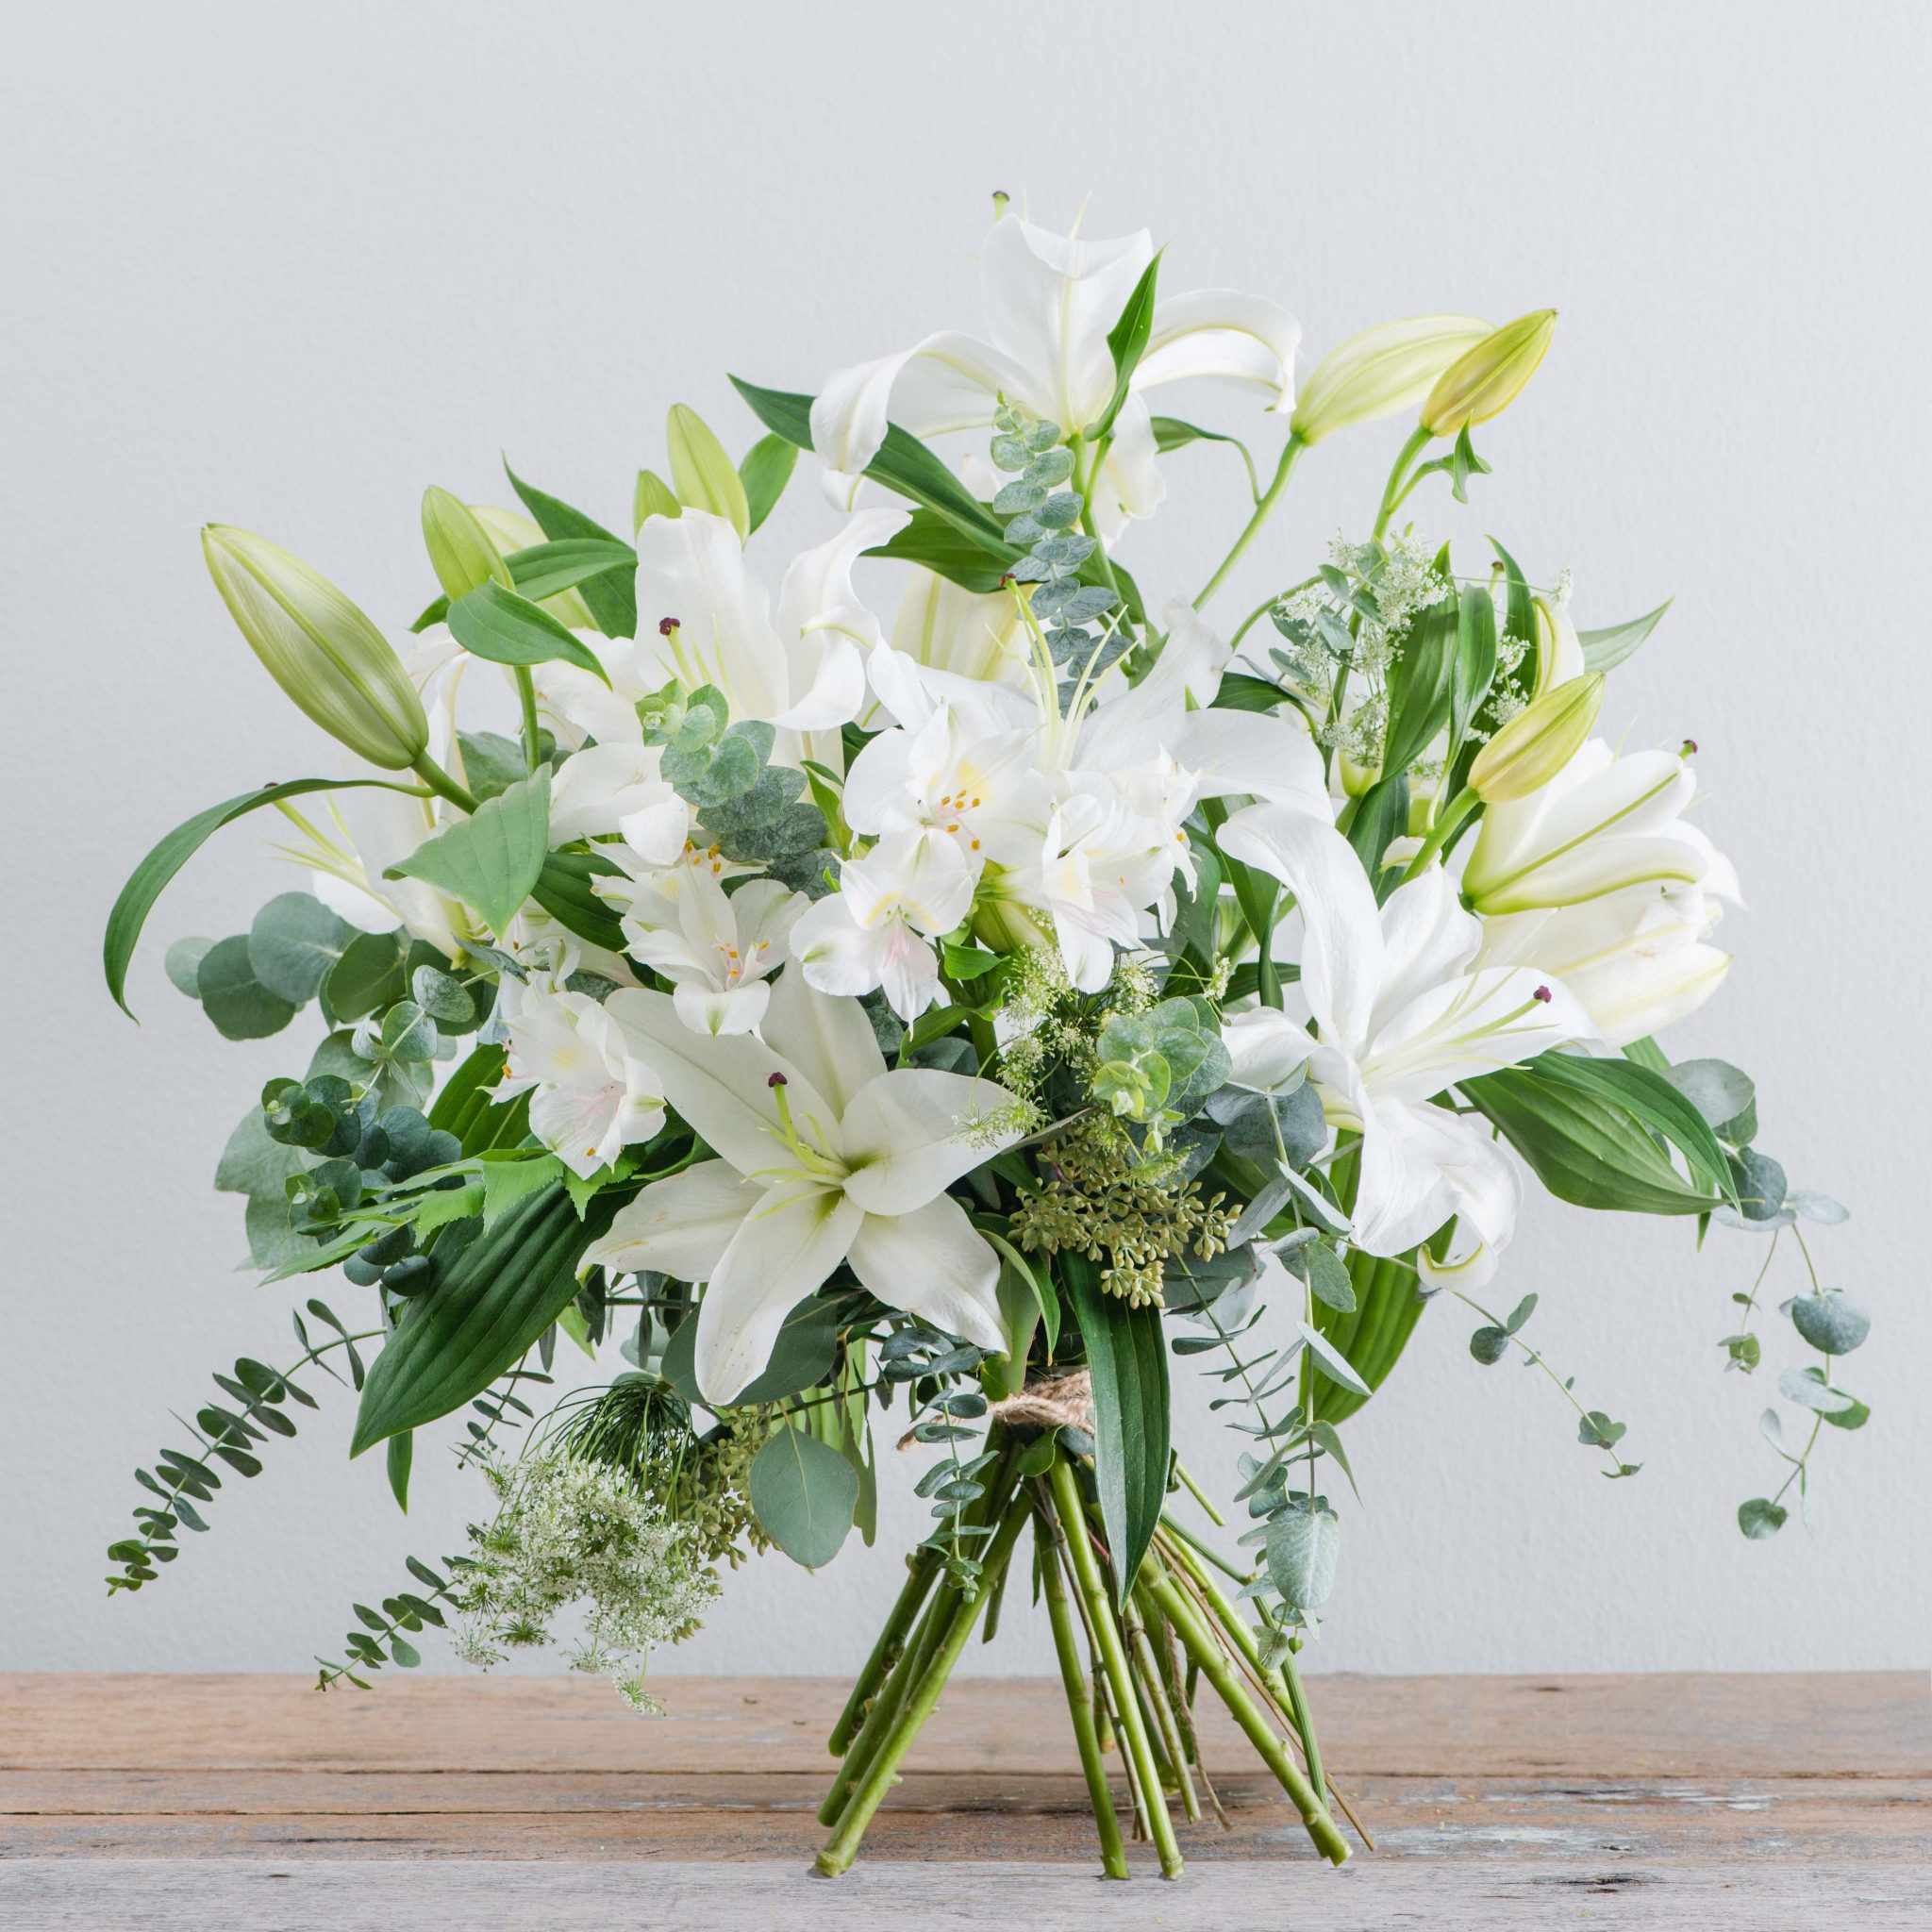 White magic flower addict flower izmirmasajfo